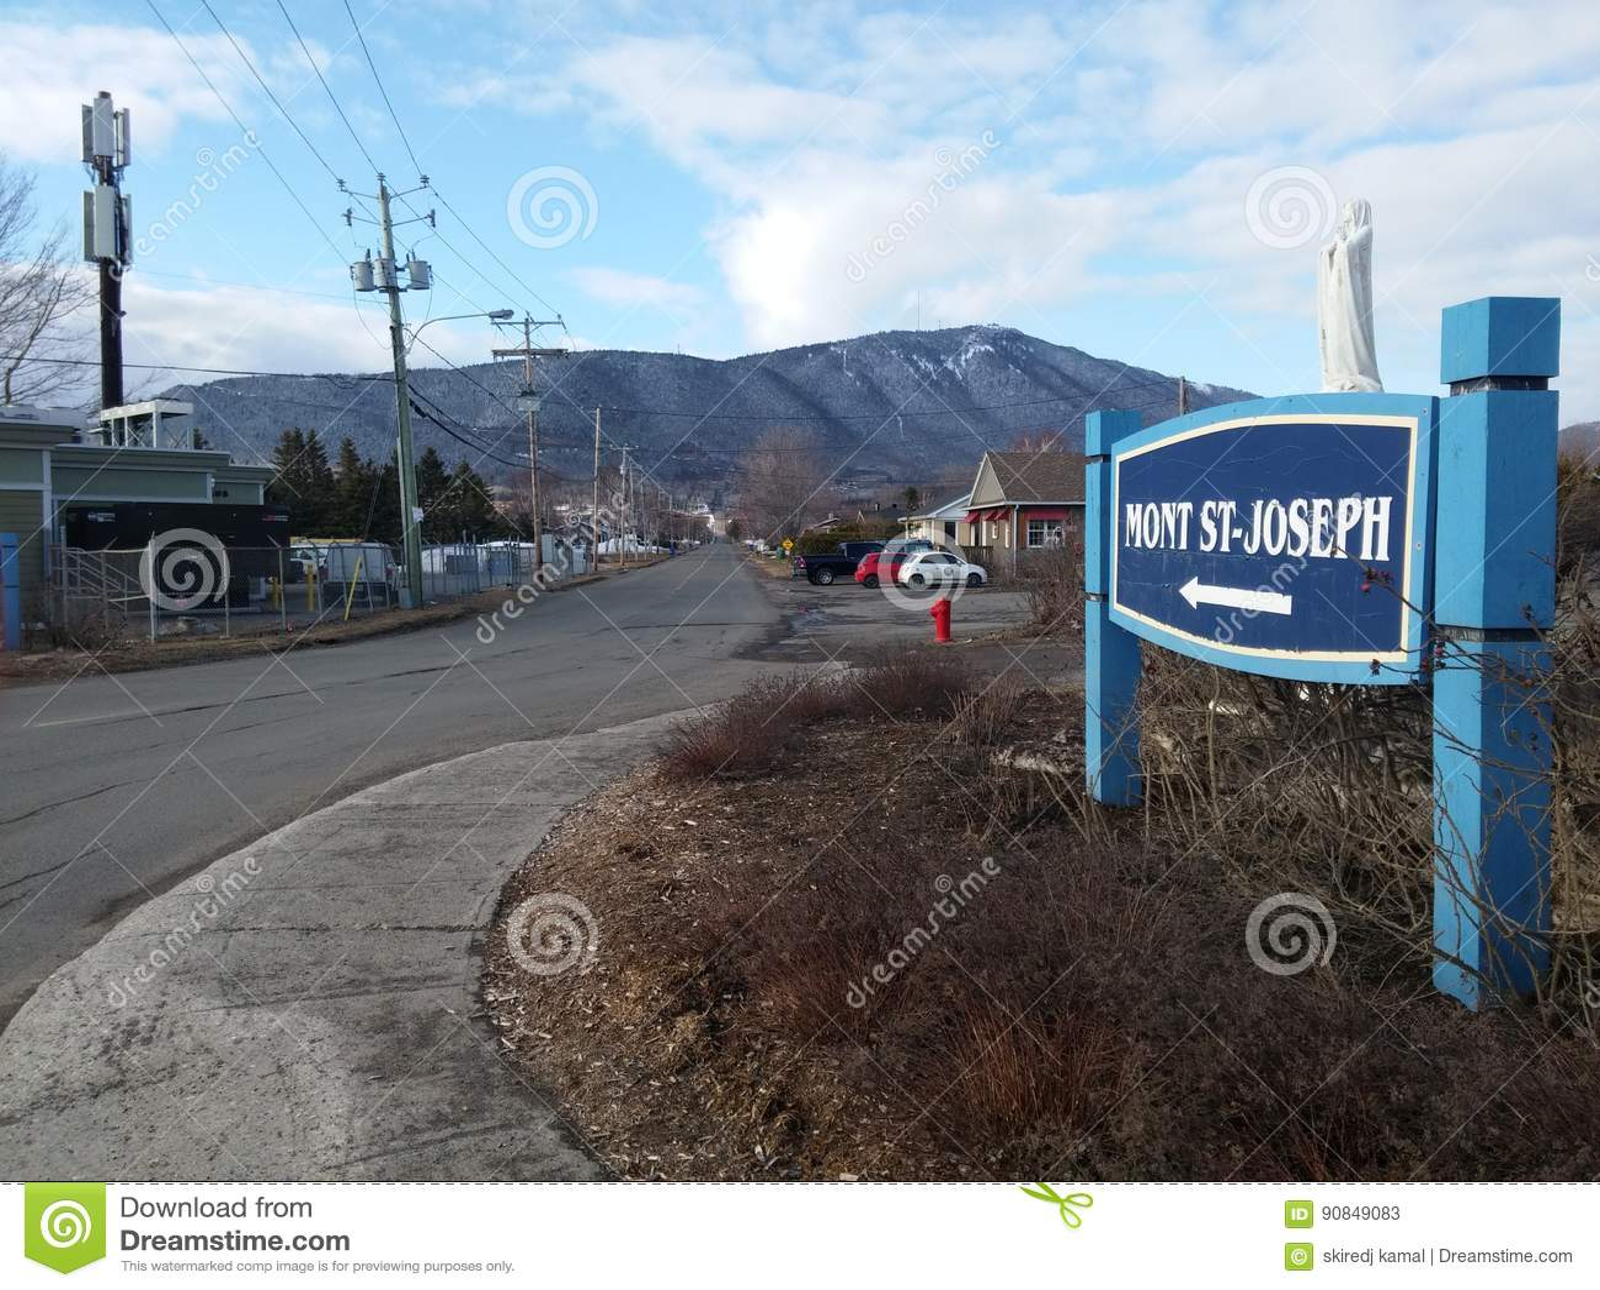 Mont saint joseph